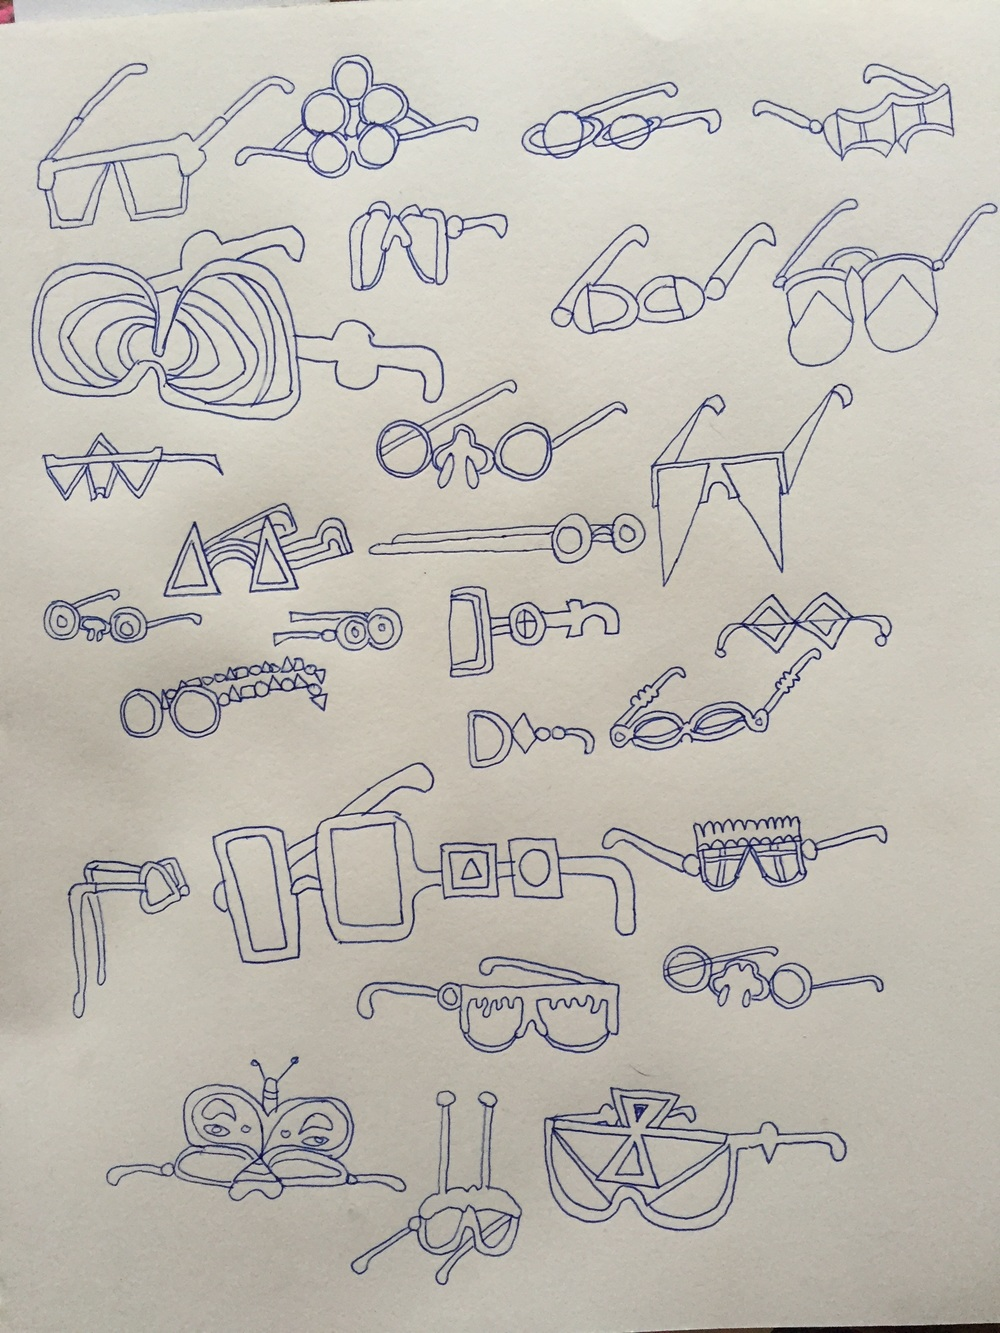 Sunglass Ideas Sketch.